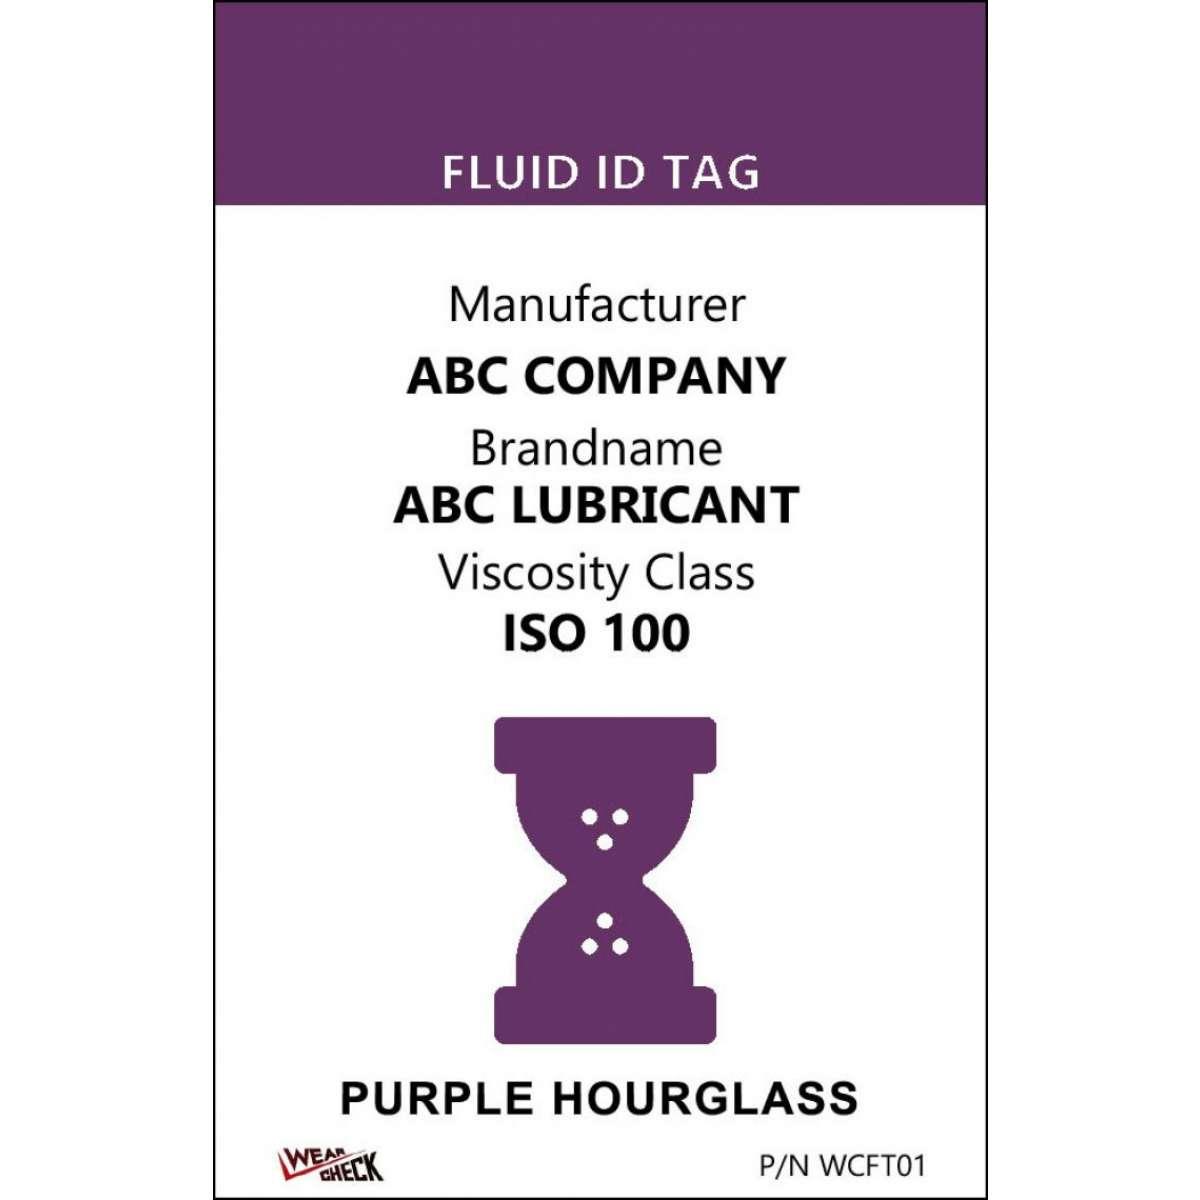 "Custom ID Label - 2.2"" x 3.4"" - Plastic Card - Single Side - Purple"